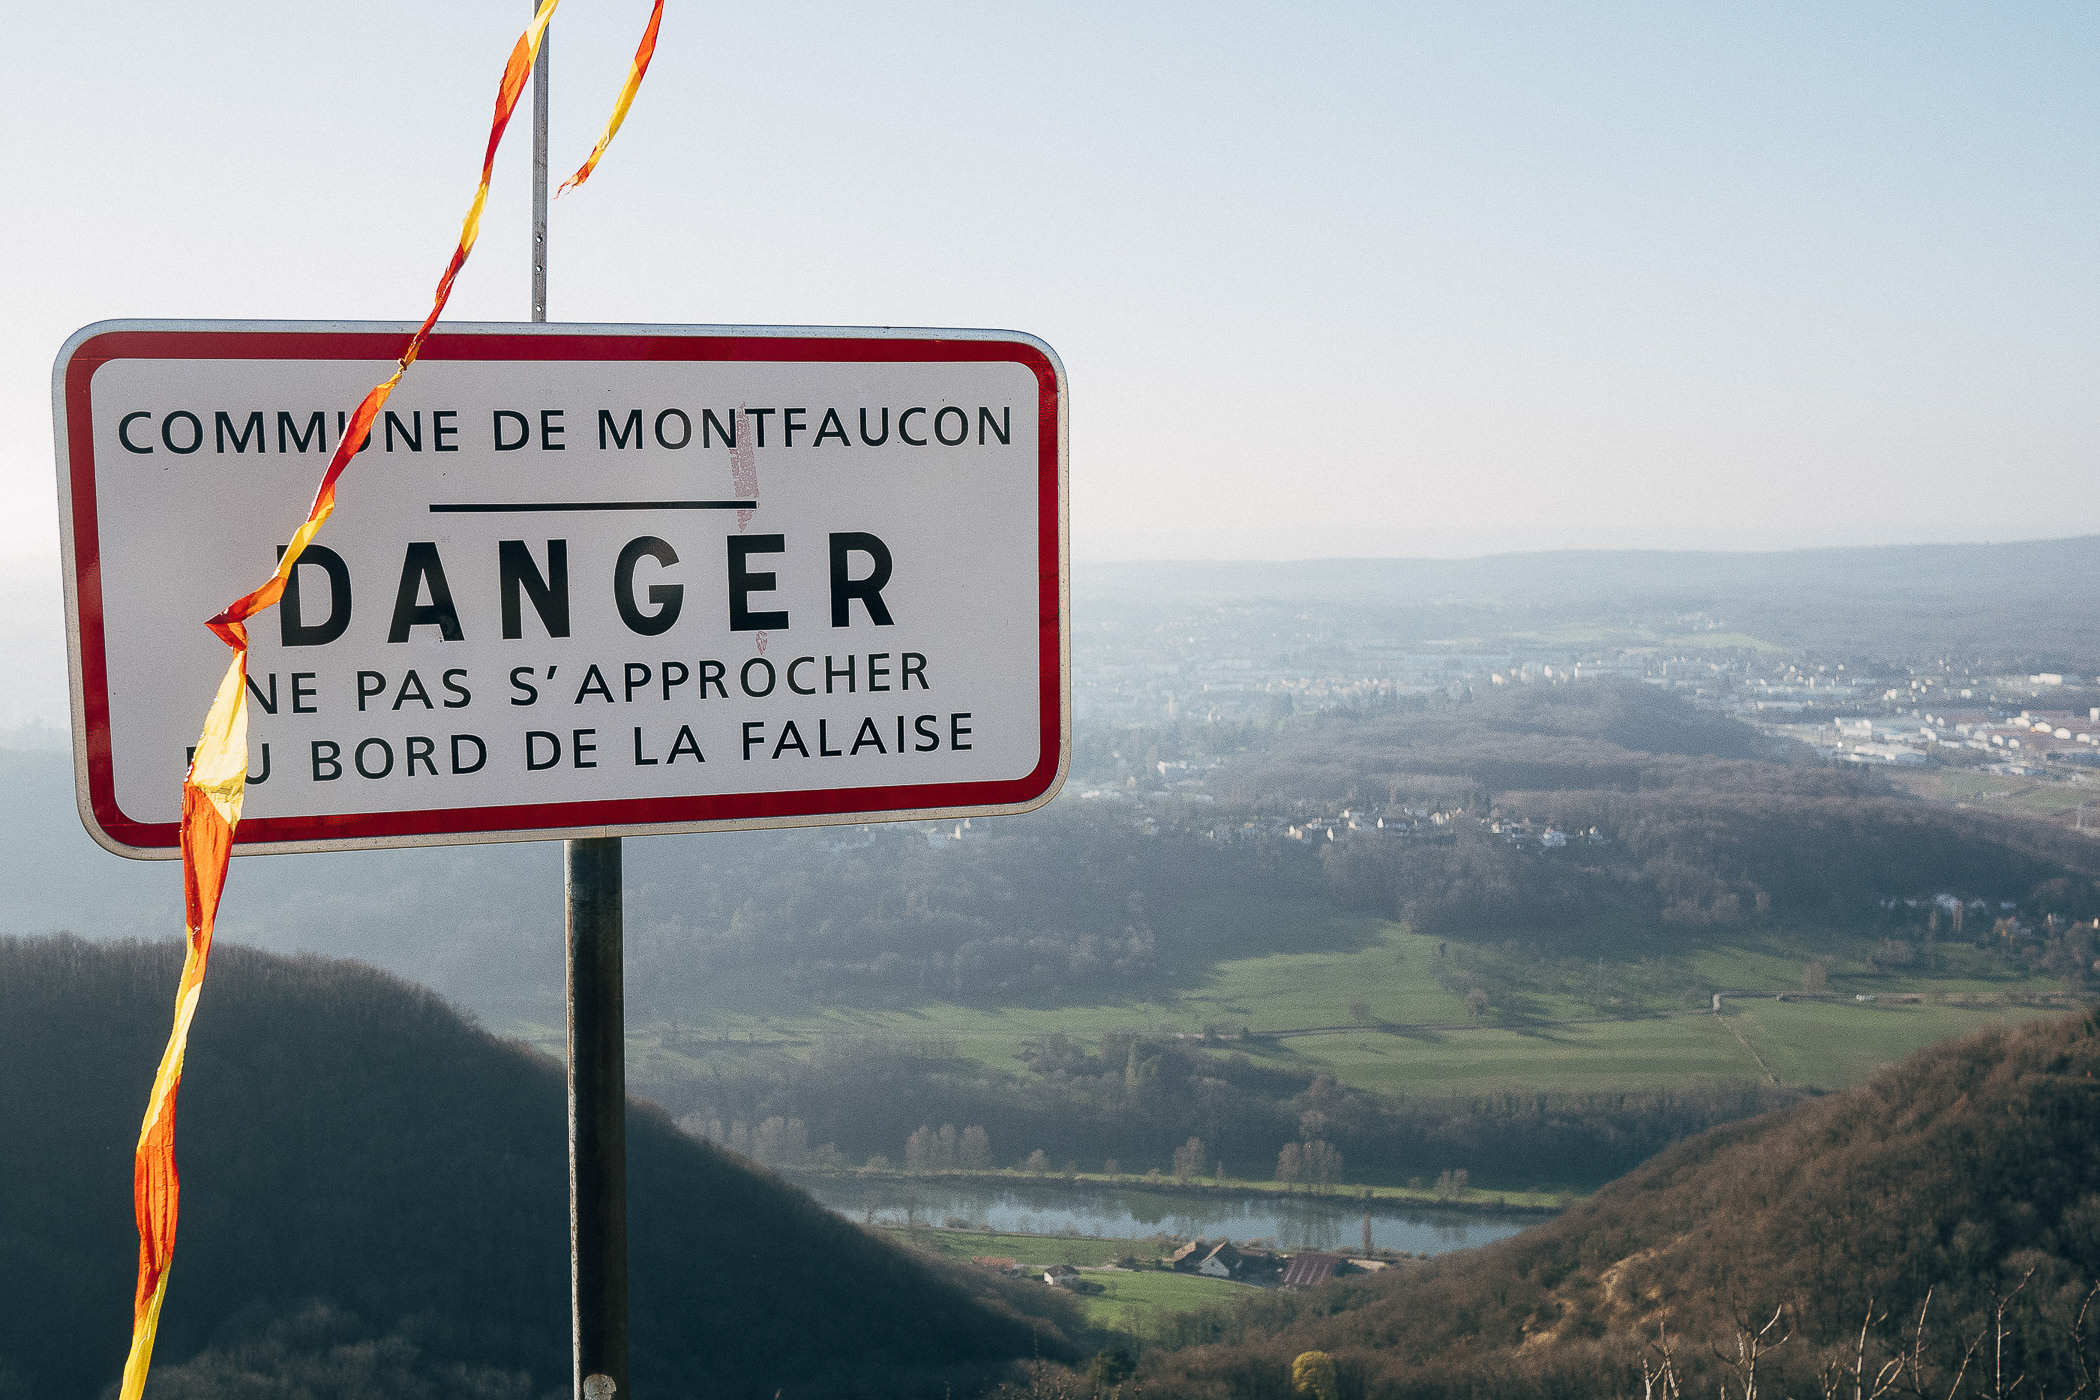 AILLEURS EN FRANCE_47.jpg